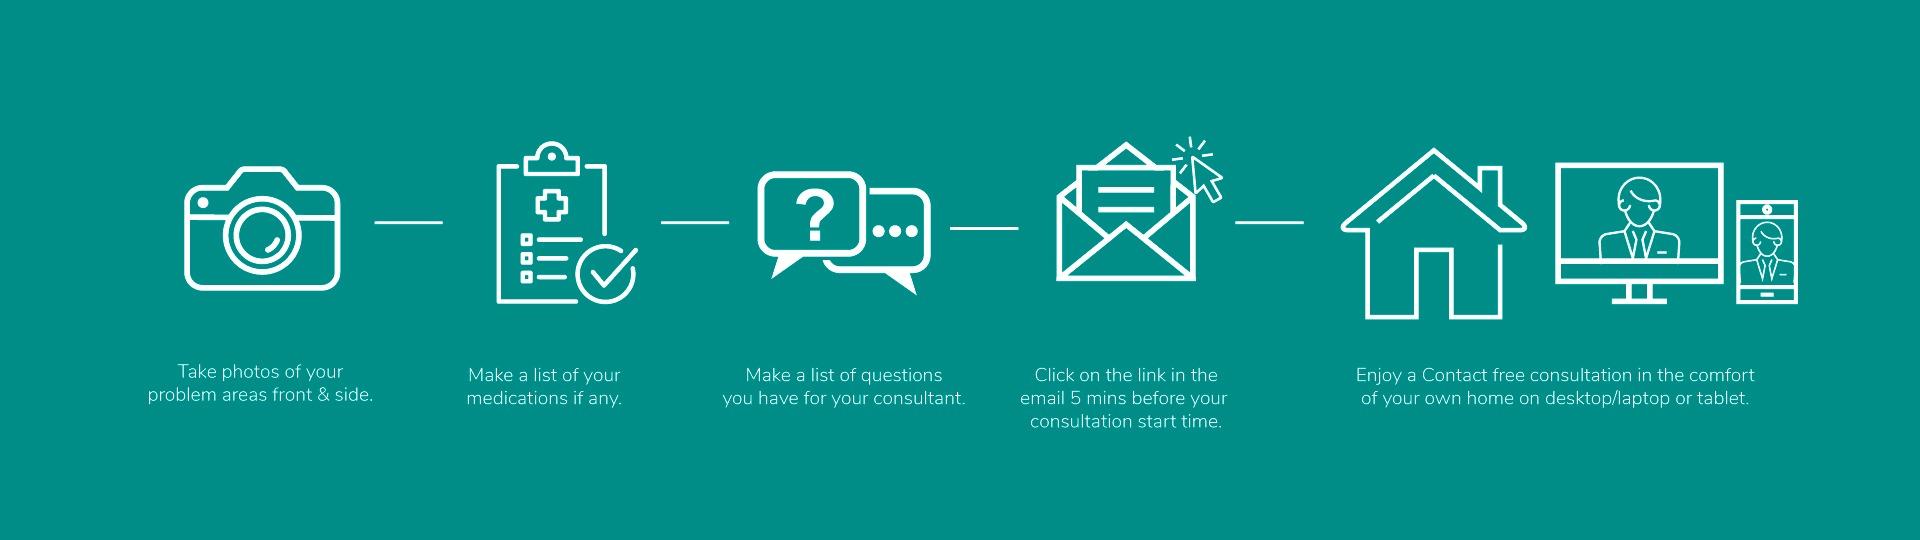 Consultation_Journey_web